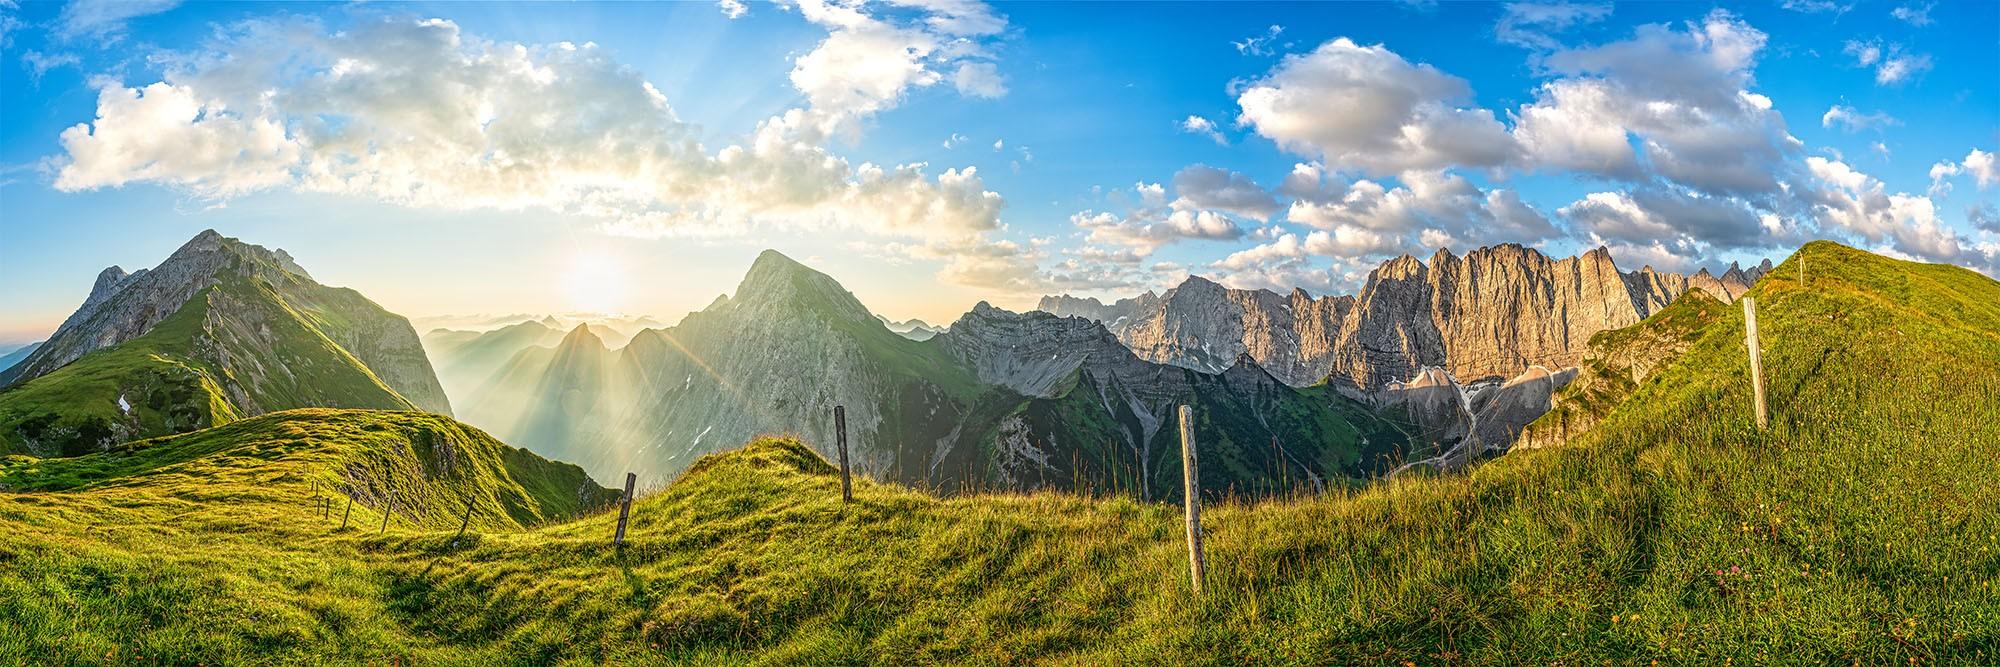 Laliderer Wand 3:1 - Sonnenaufgang in den Bergen - Karwendelgebirge